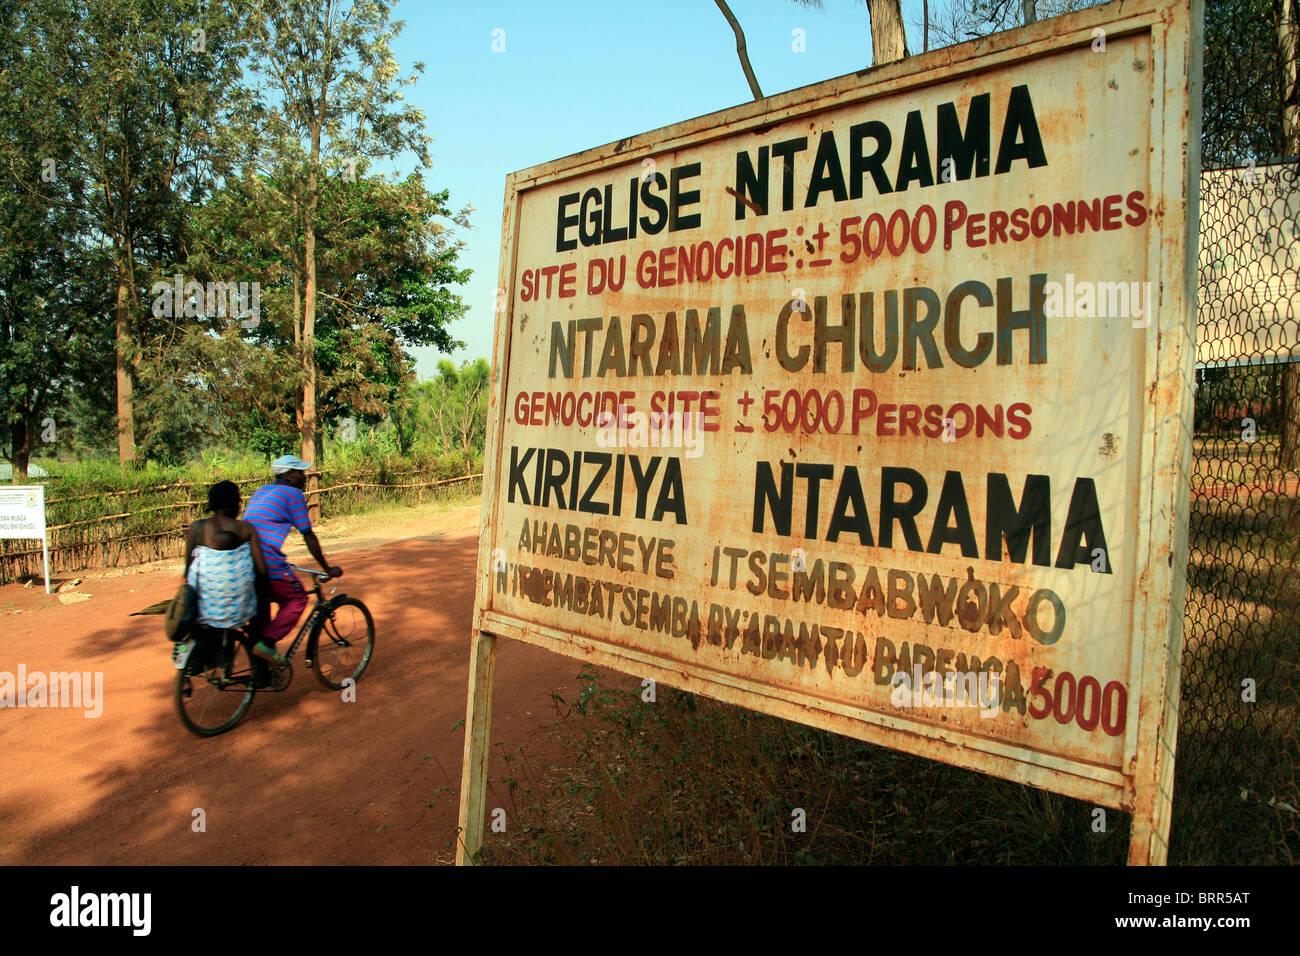 Ntarama Church where 5000 people were killed during the 1994 genocide in Rwanda - Stock Image